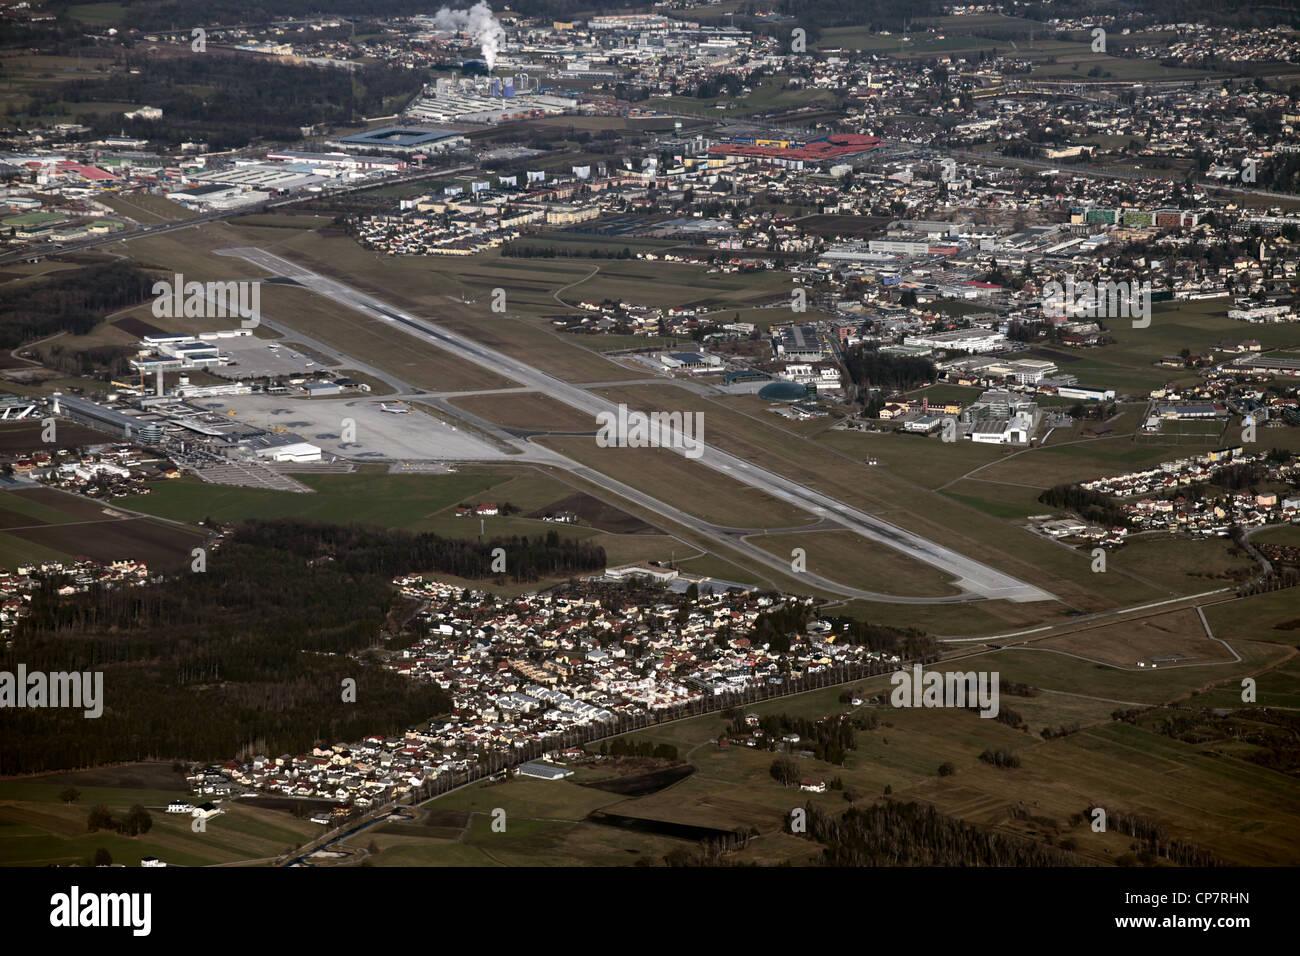 AIRPORT RUNWAY FROM UNTERSBERG MOUNT SALZBURG AUSTRIA 28 December 2011 - Stock Image